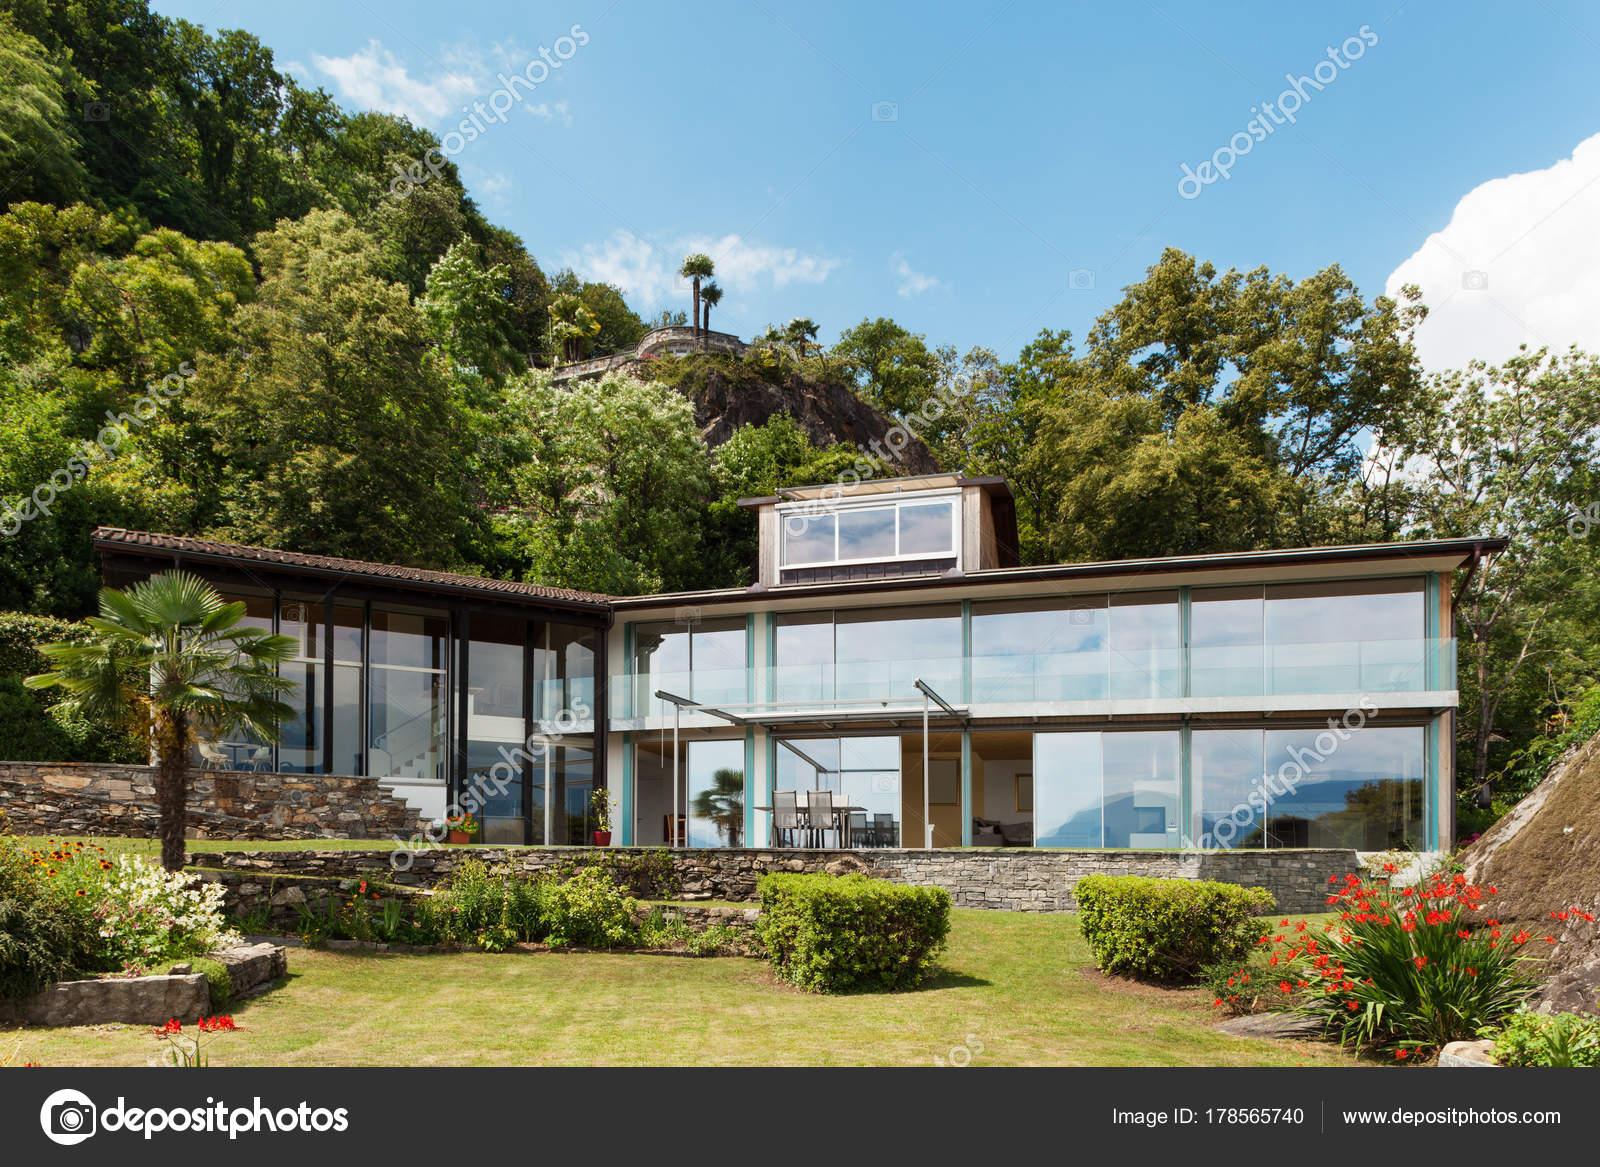 Casa montanha arquitetura moderna livre stock photo for Piccola casa moderna progetta un piano